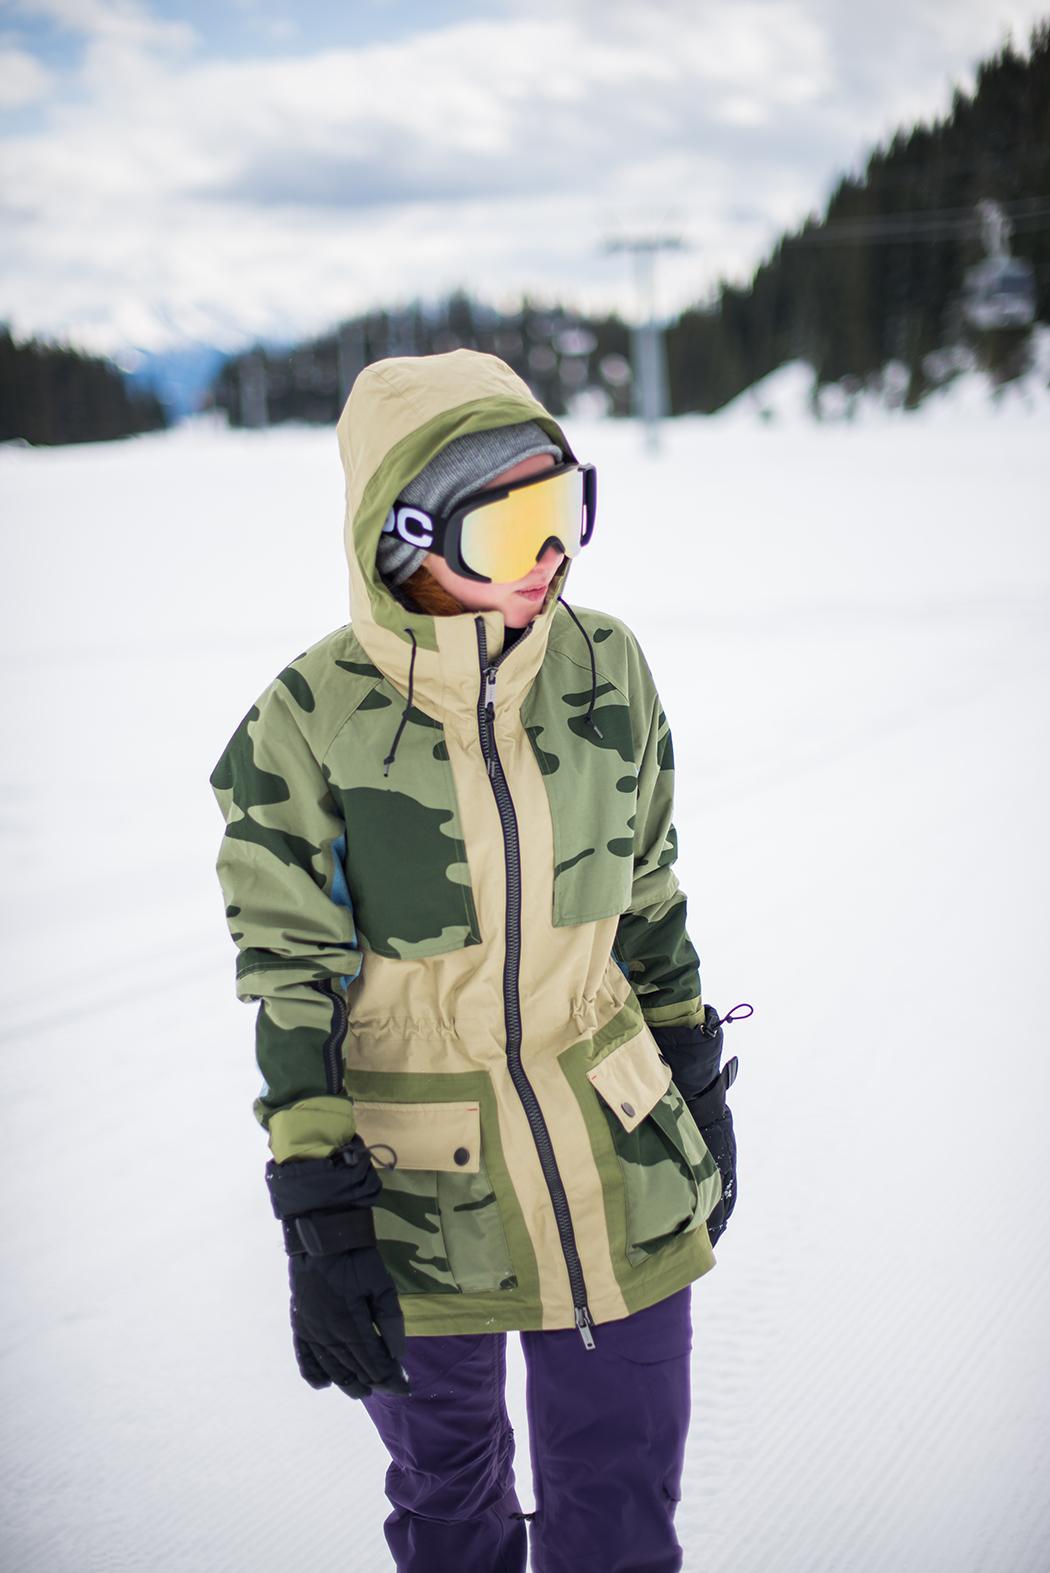 Fitnessblog-Fitnessblogger-Fitness-Blog-Blogger-Snowboarden-Burton-Laax-Rockresort-Lindarella-91